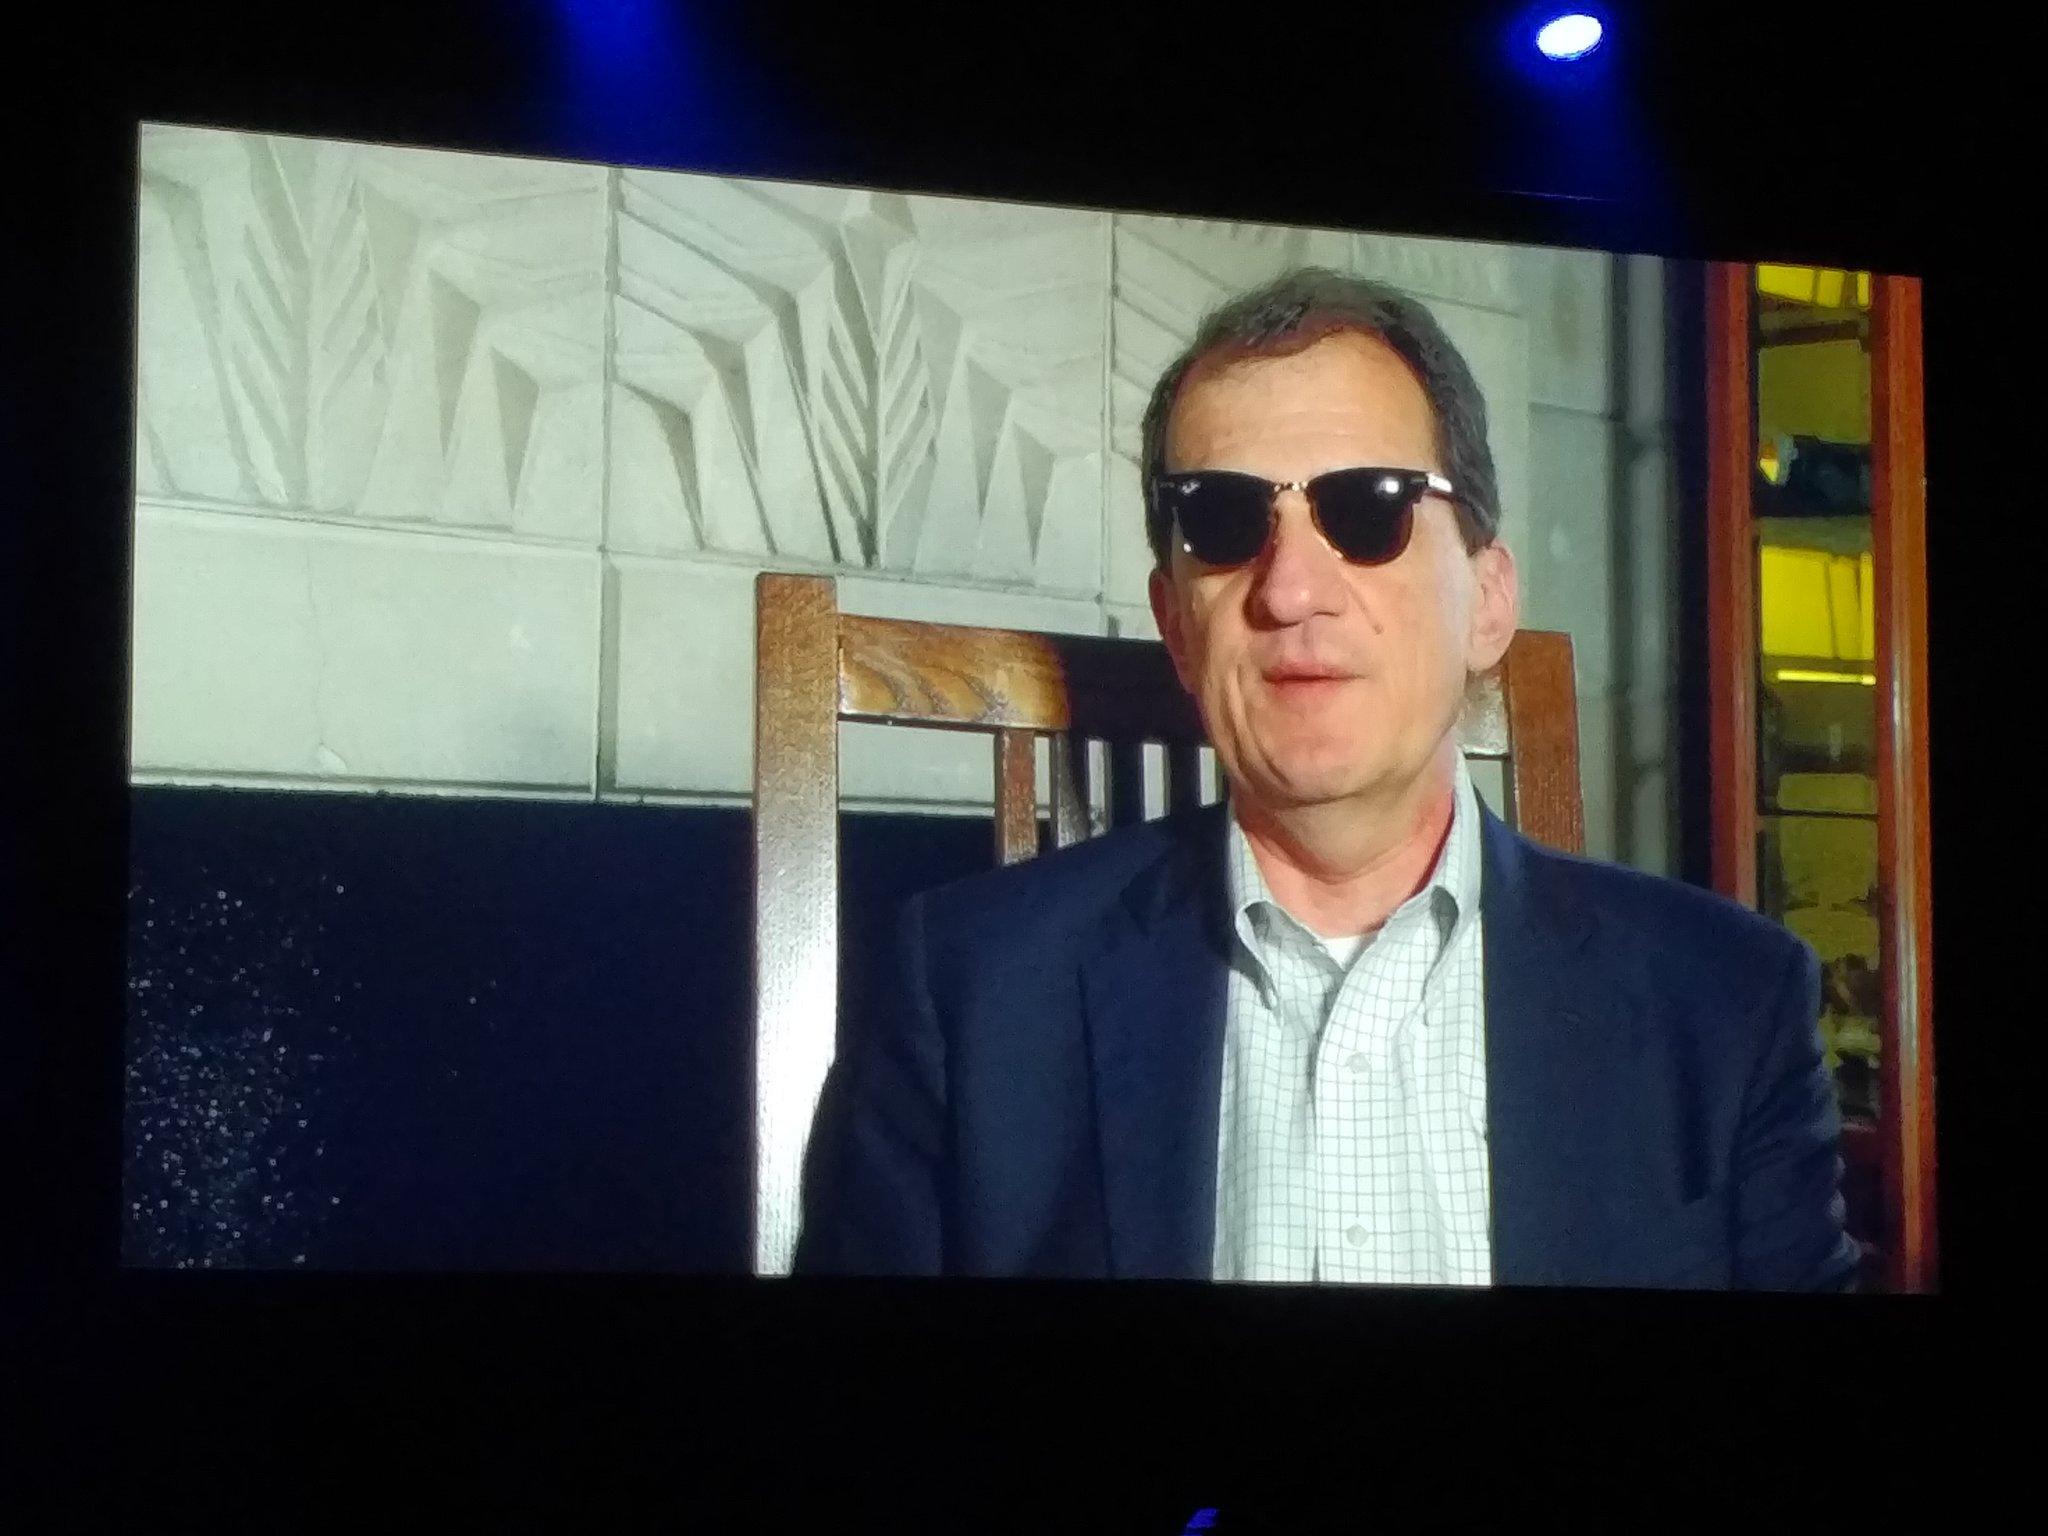 Dean Douglas - video intro -  Rockstar or Godfather? #CenturyLinkAscend https://t.co/o8FtFkP23B